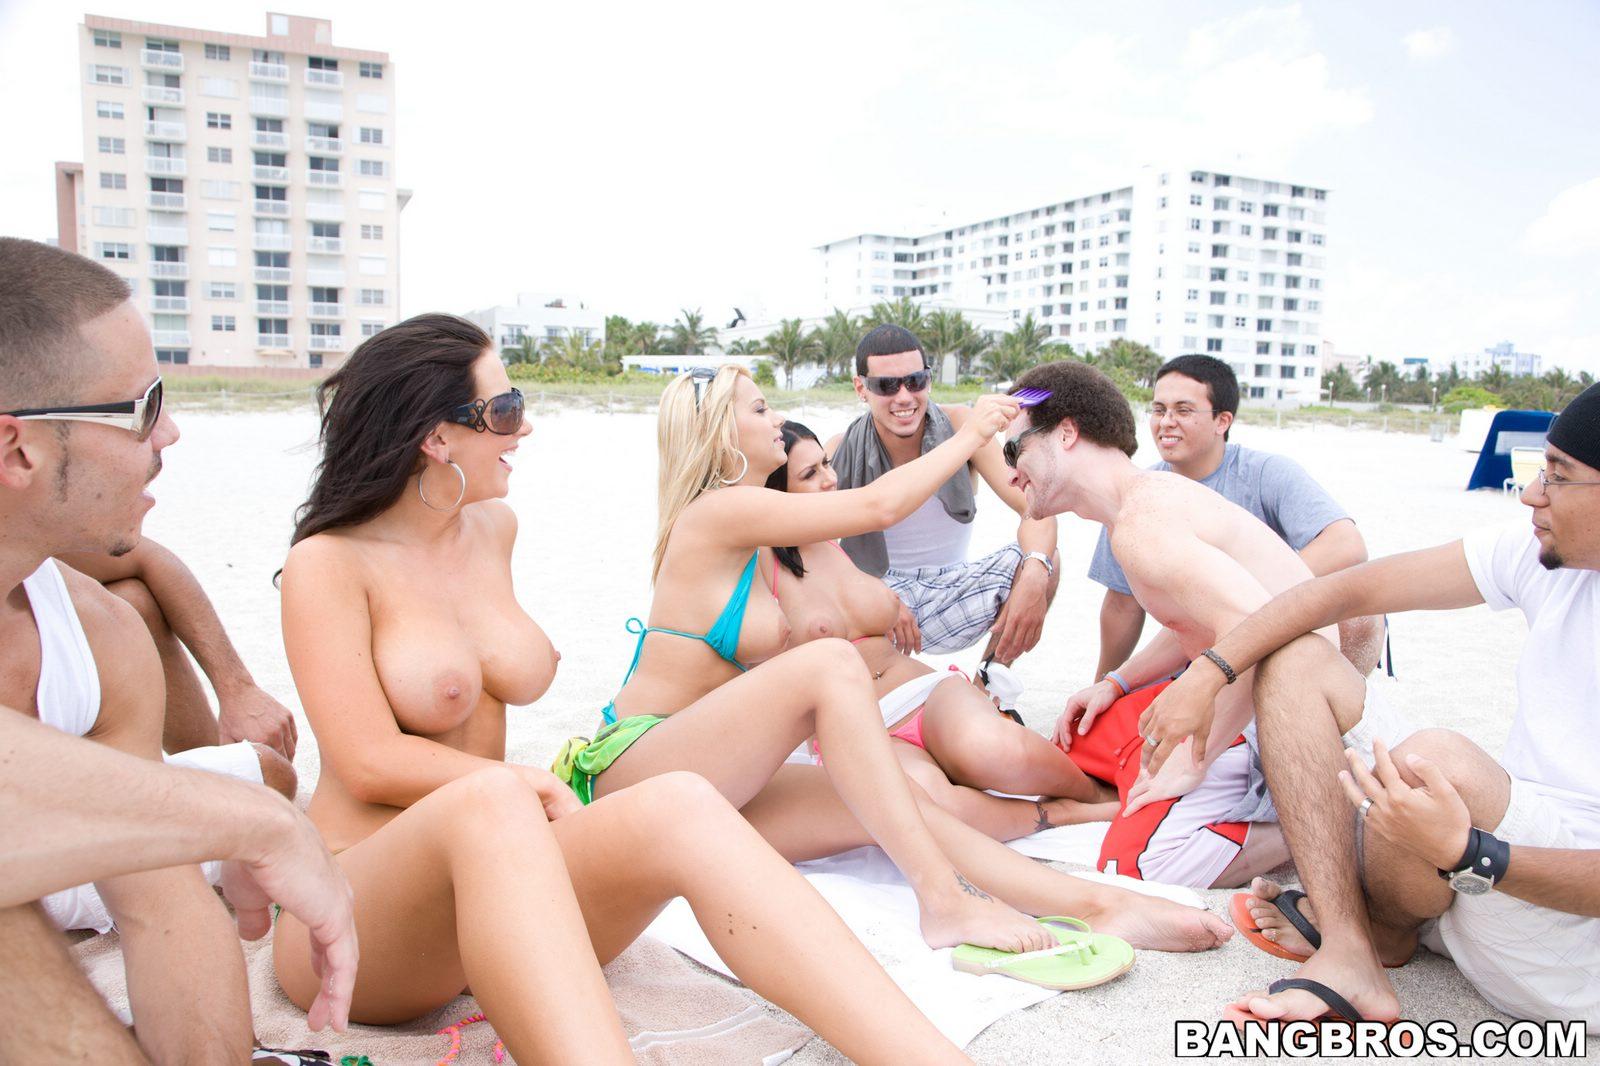 Ashlynn Brooke Sex Video remarkable, rather jayden brooke nude consider - penty photo